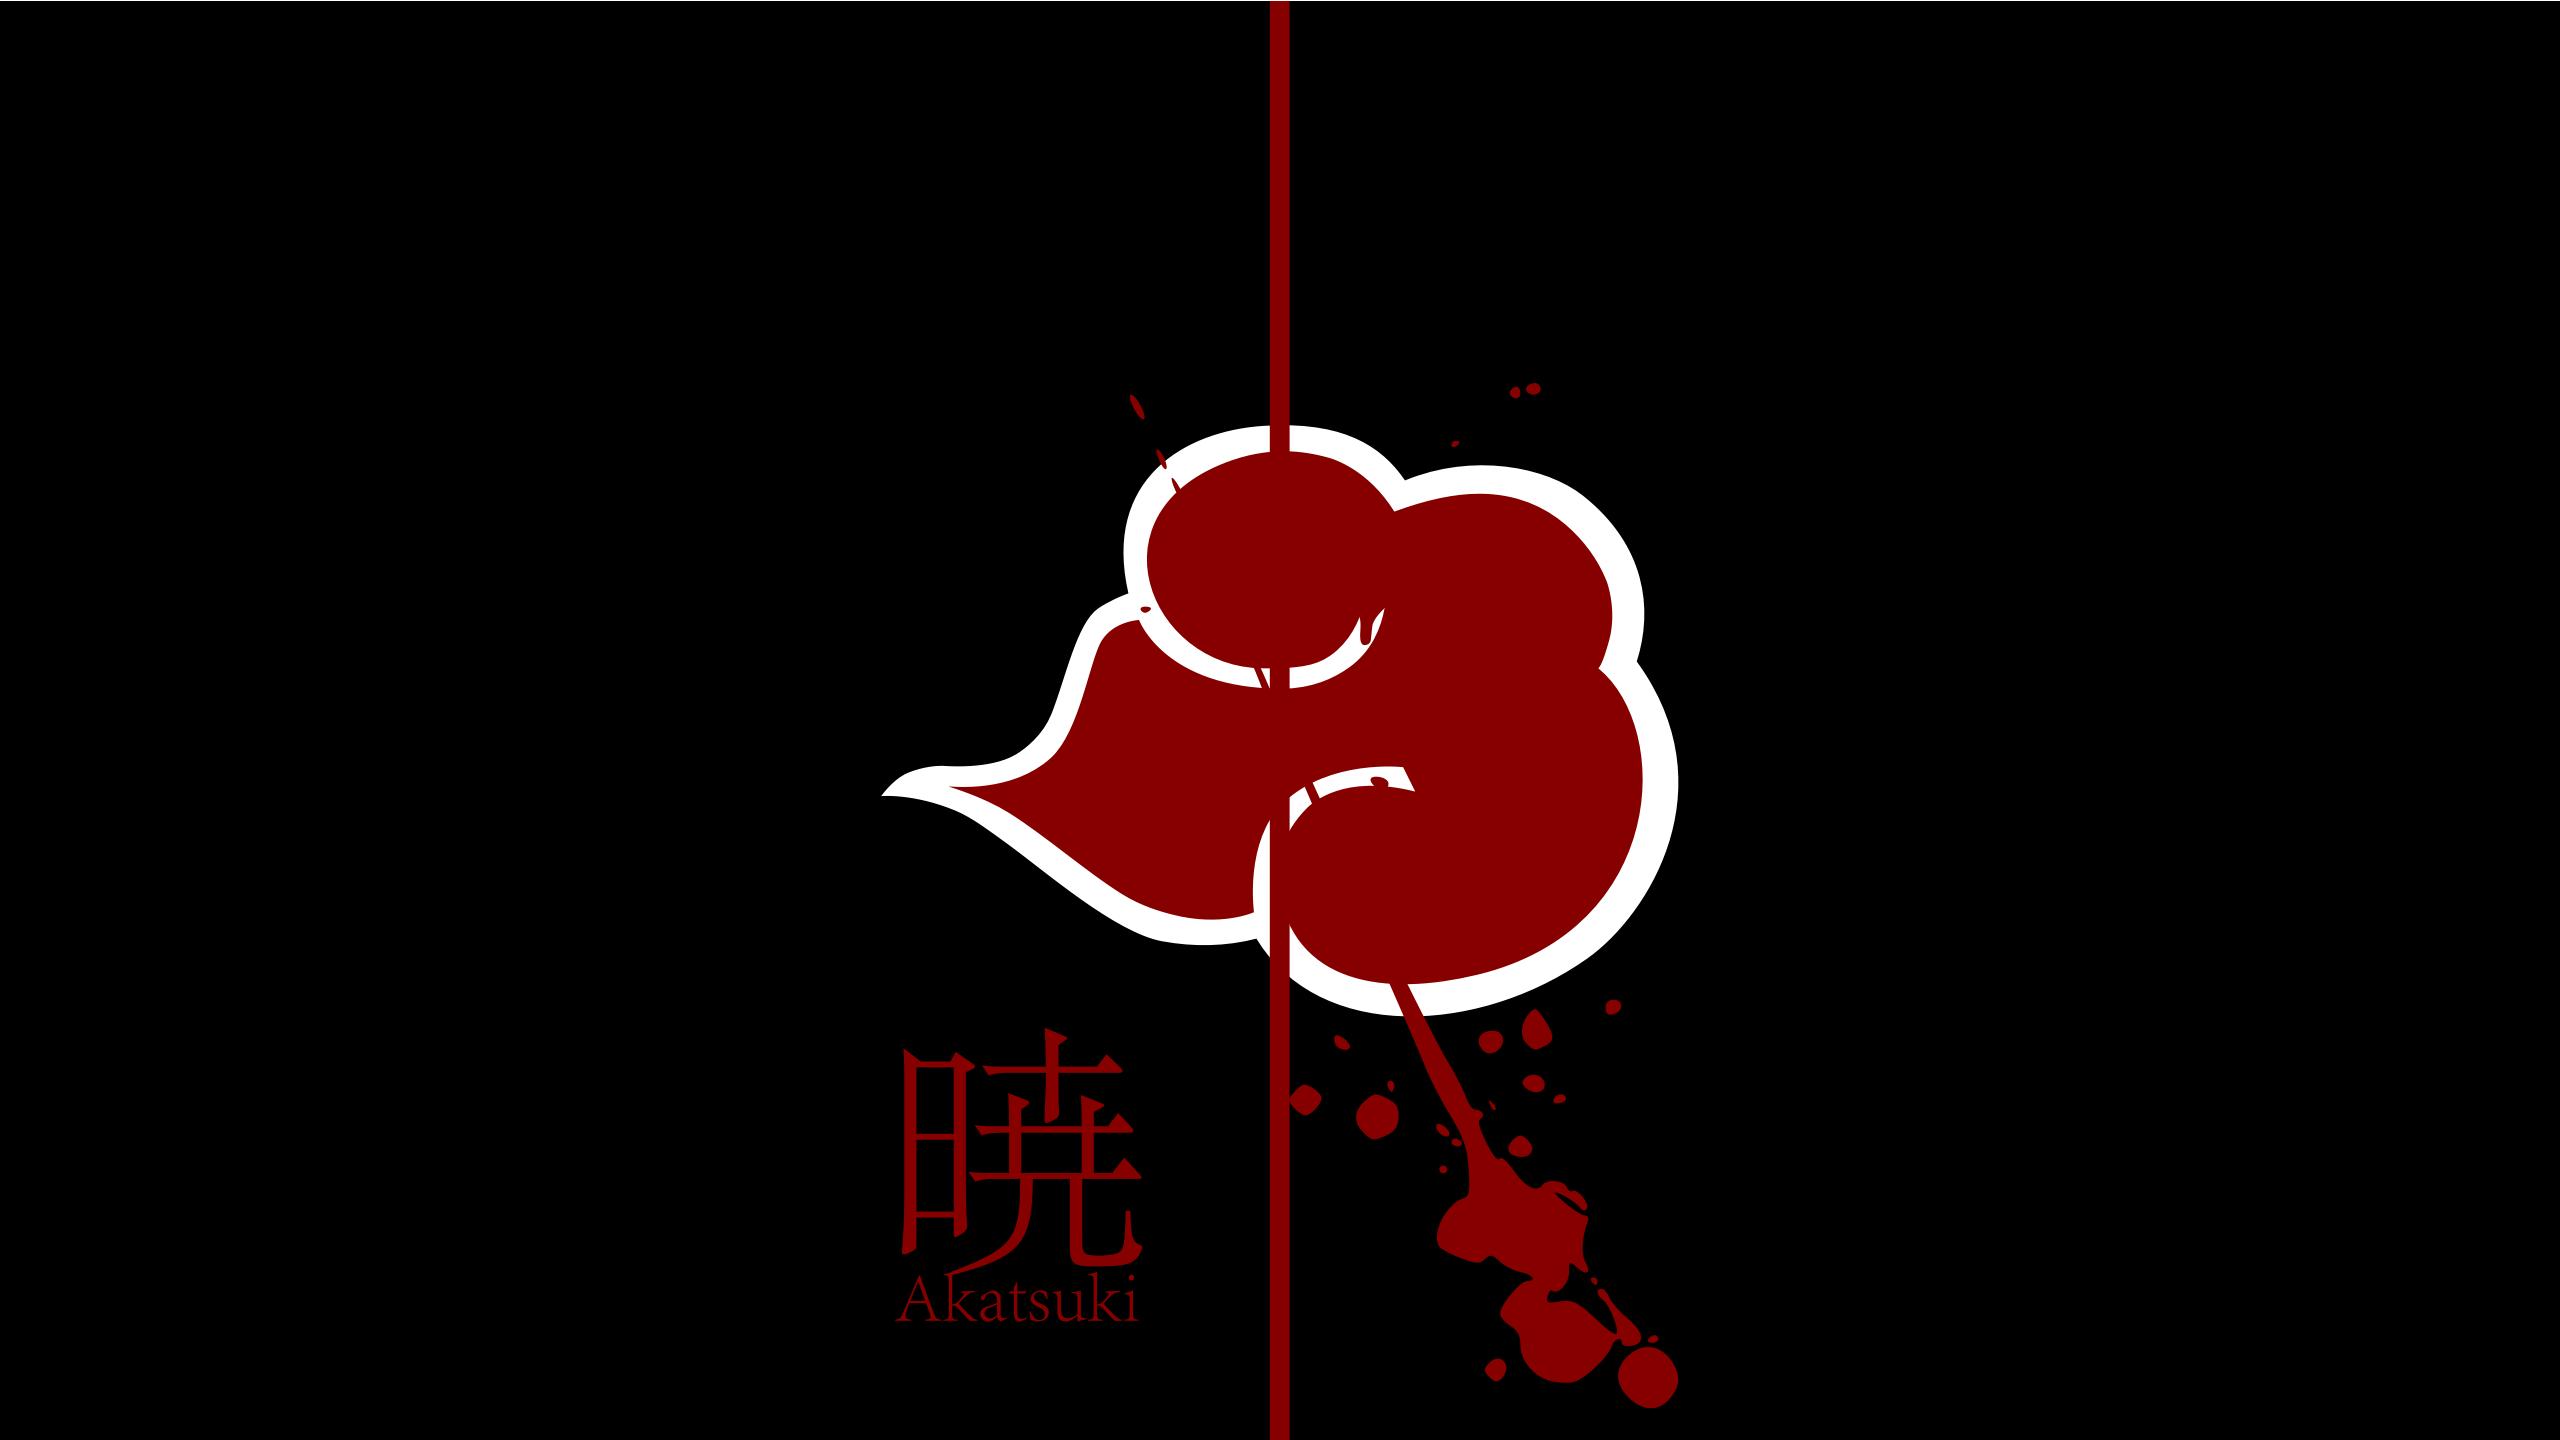 Akatsuki Wallpapers - WallpaperSafari